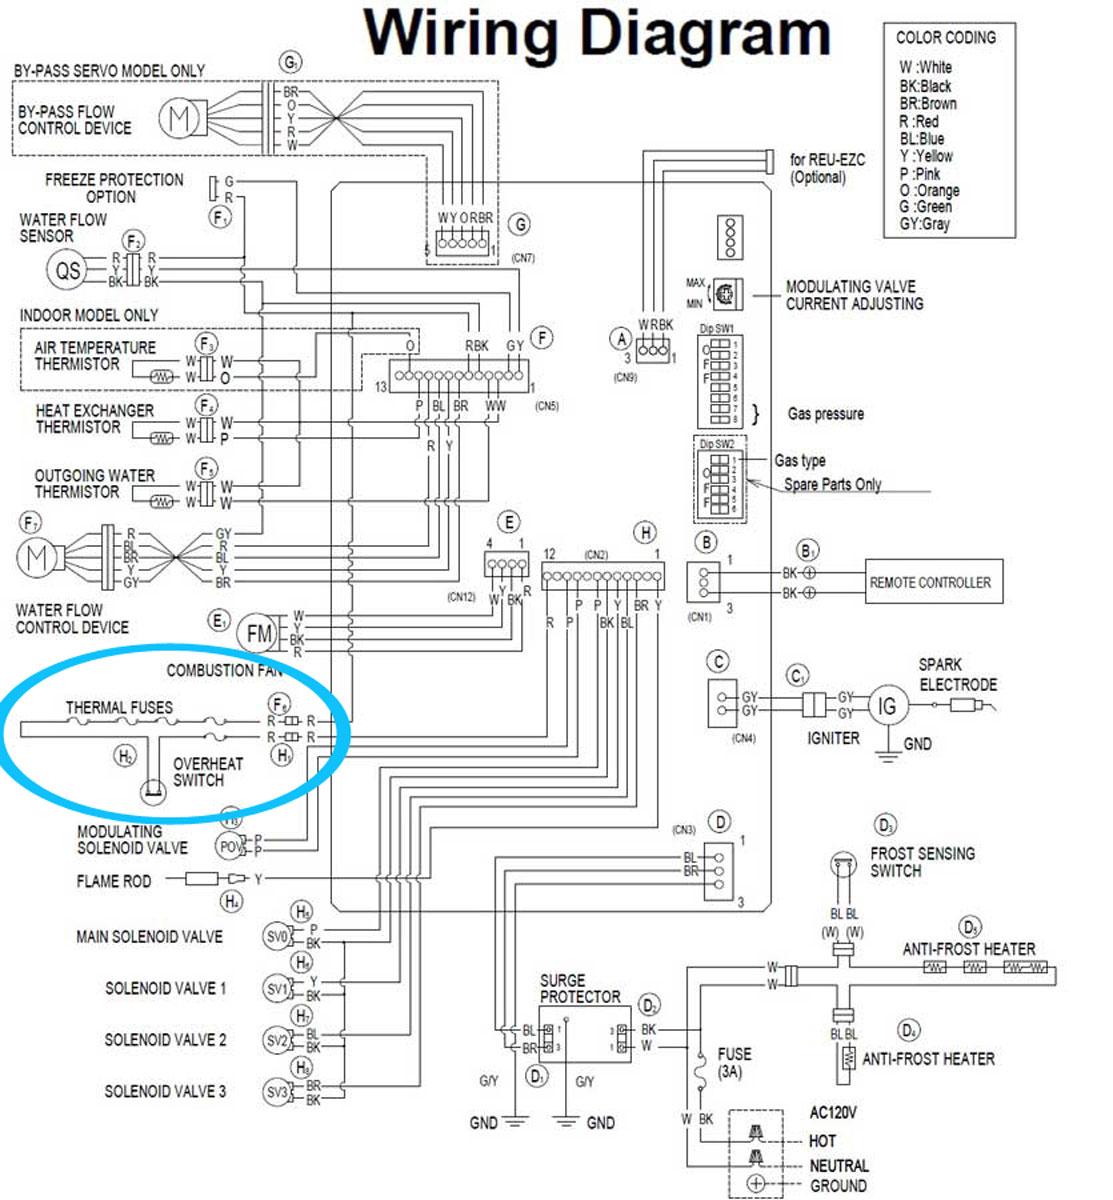 Incredible Electric Hot Water Tank Wiring Diagram Download Wiring Diagram Sample Wiring Cloud Waroletkolfr09Org